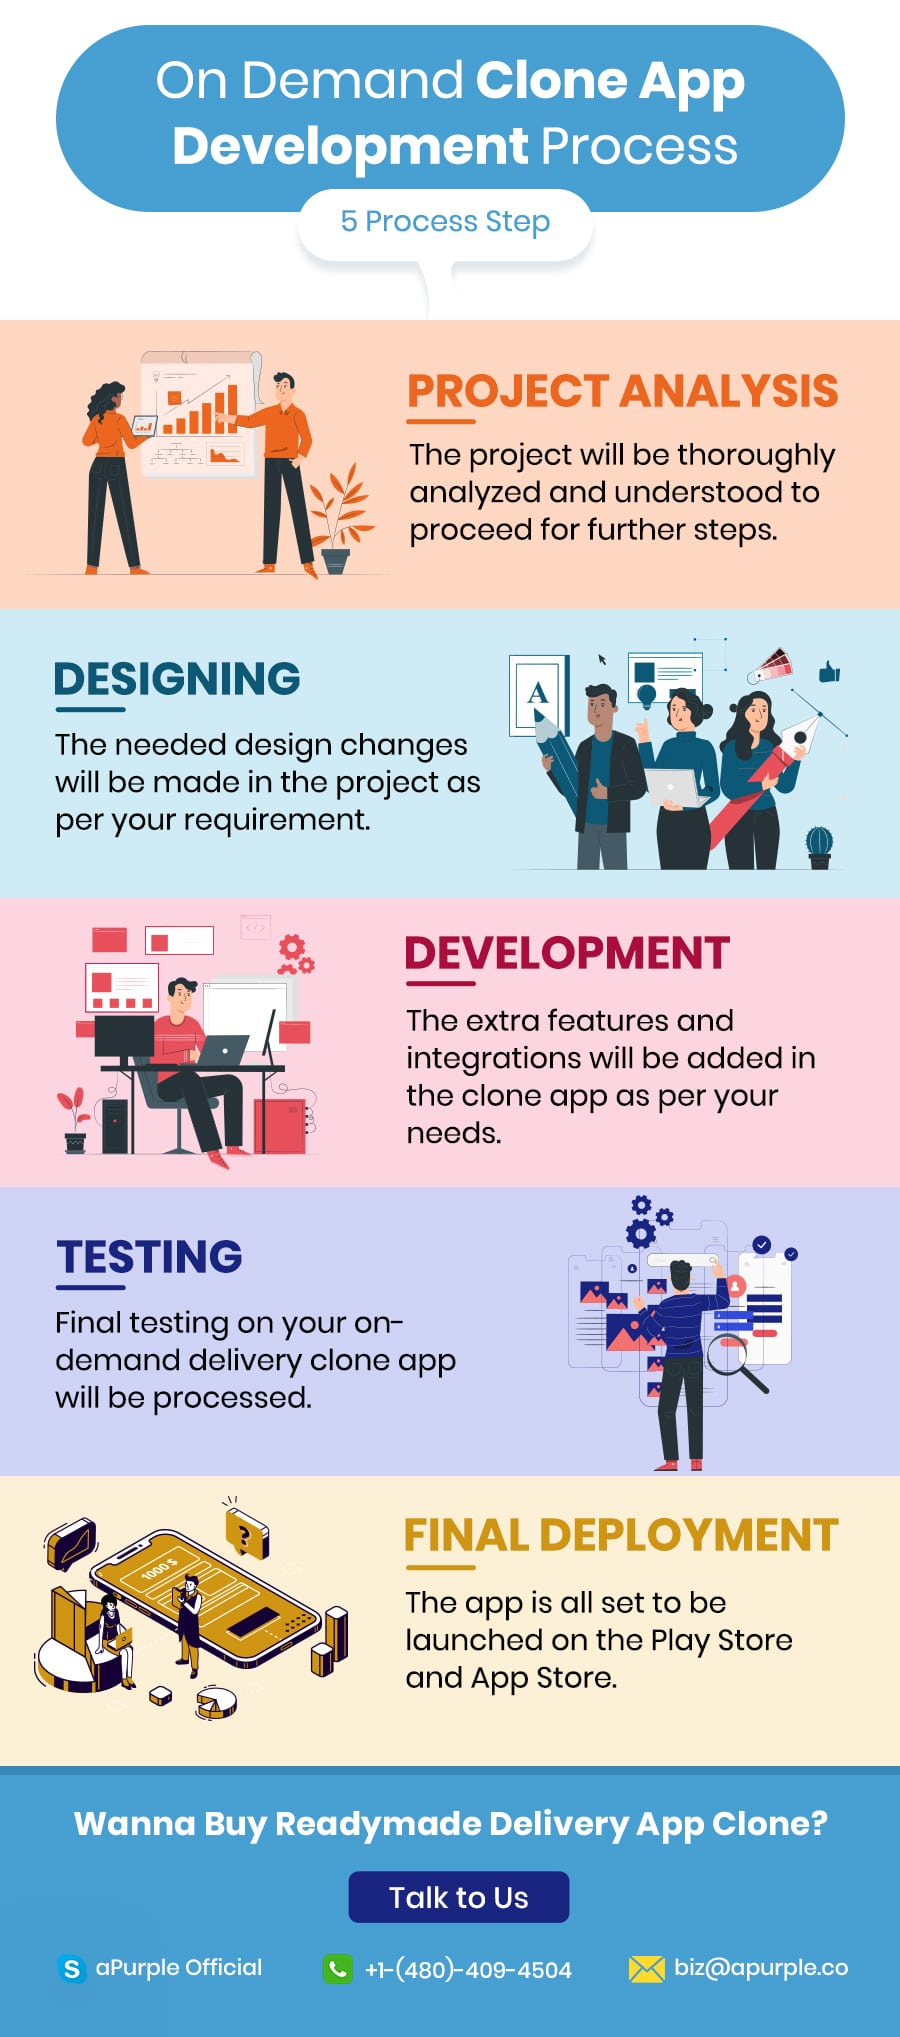 On demand service app clone process